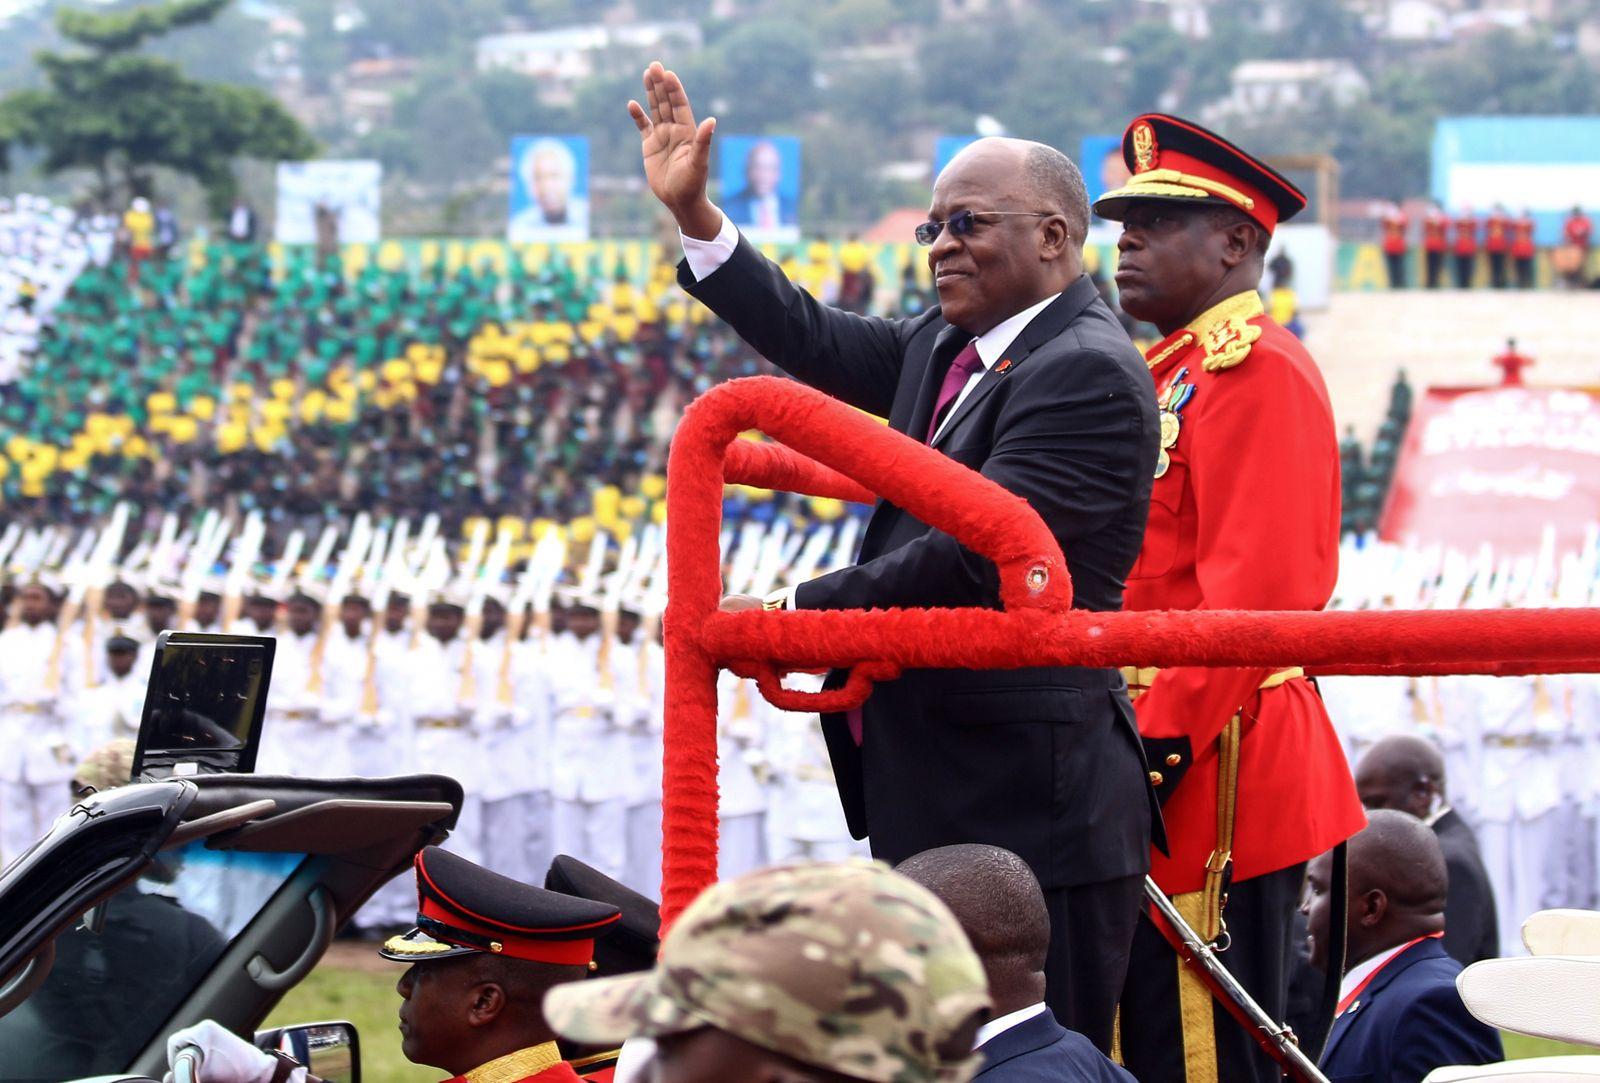 TANAZANIA-POLITICS-ANNIVERSARY-INDEPENDENCE